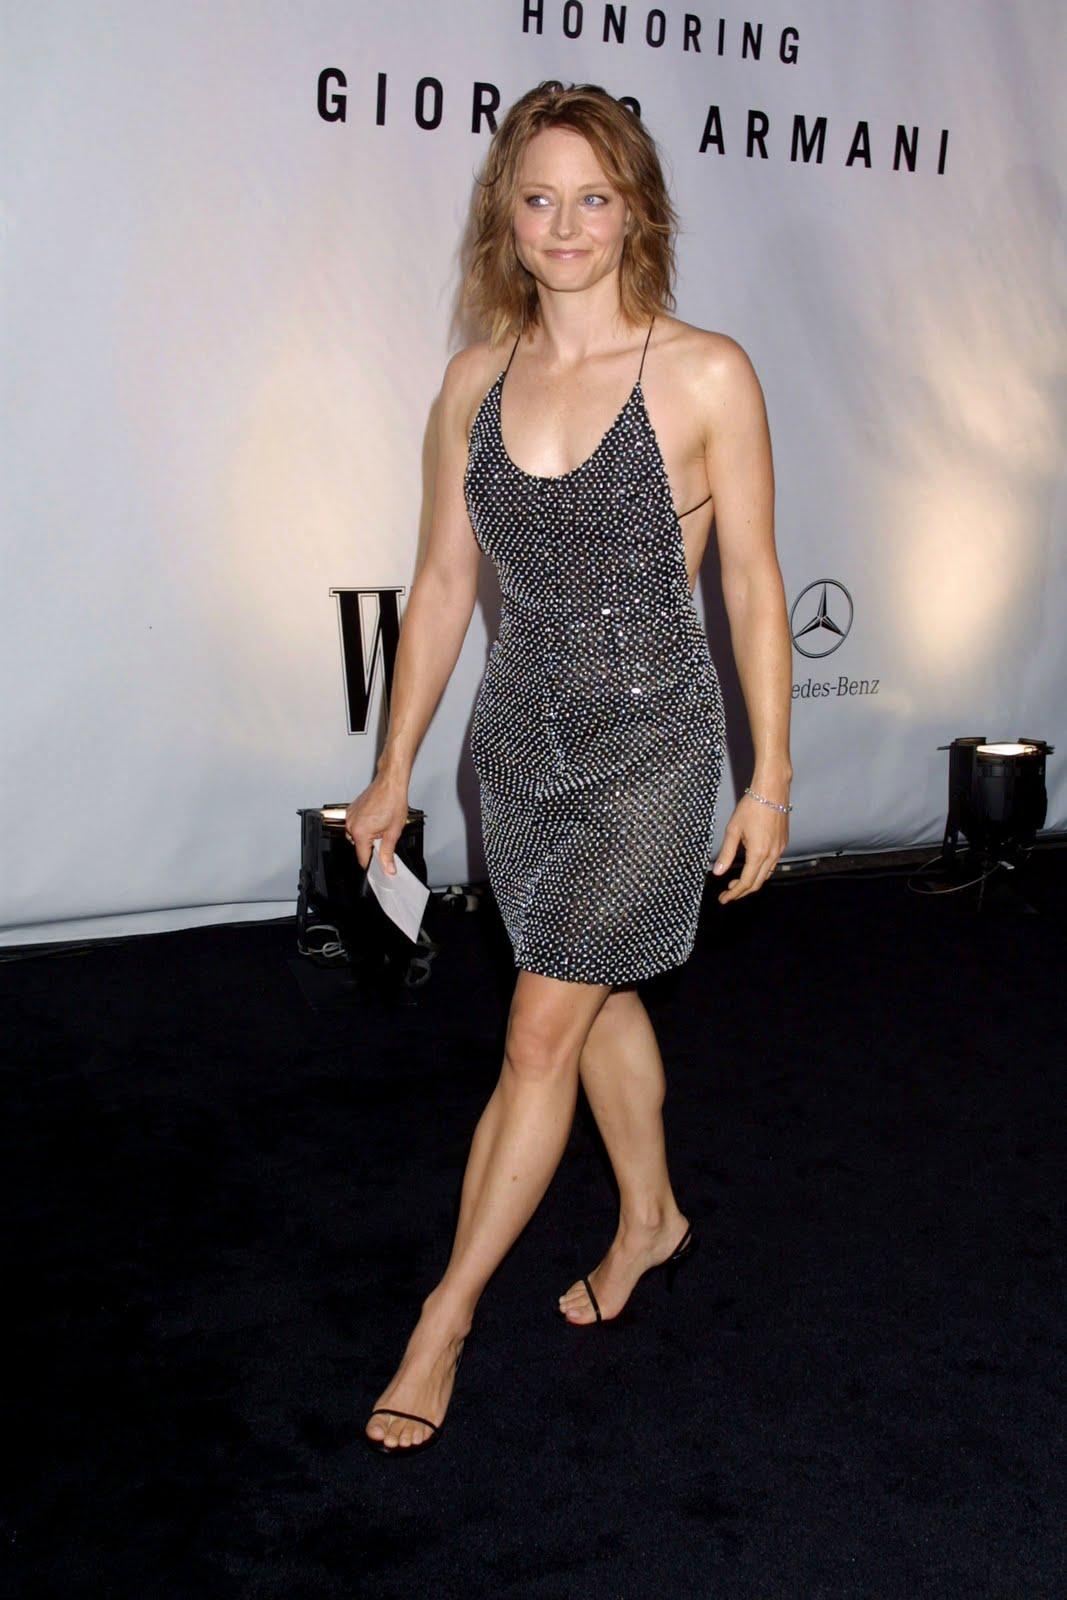 http://2.bp.blogspot.com/_vBAIG6nJkGY/TJu2NsteckI/AAAAAAAAD4o/XSM7rqFWPfc/s1600/Jodie-Foster-Feet-30386.jpg